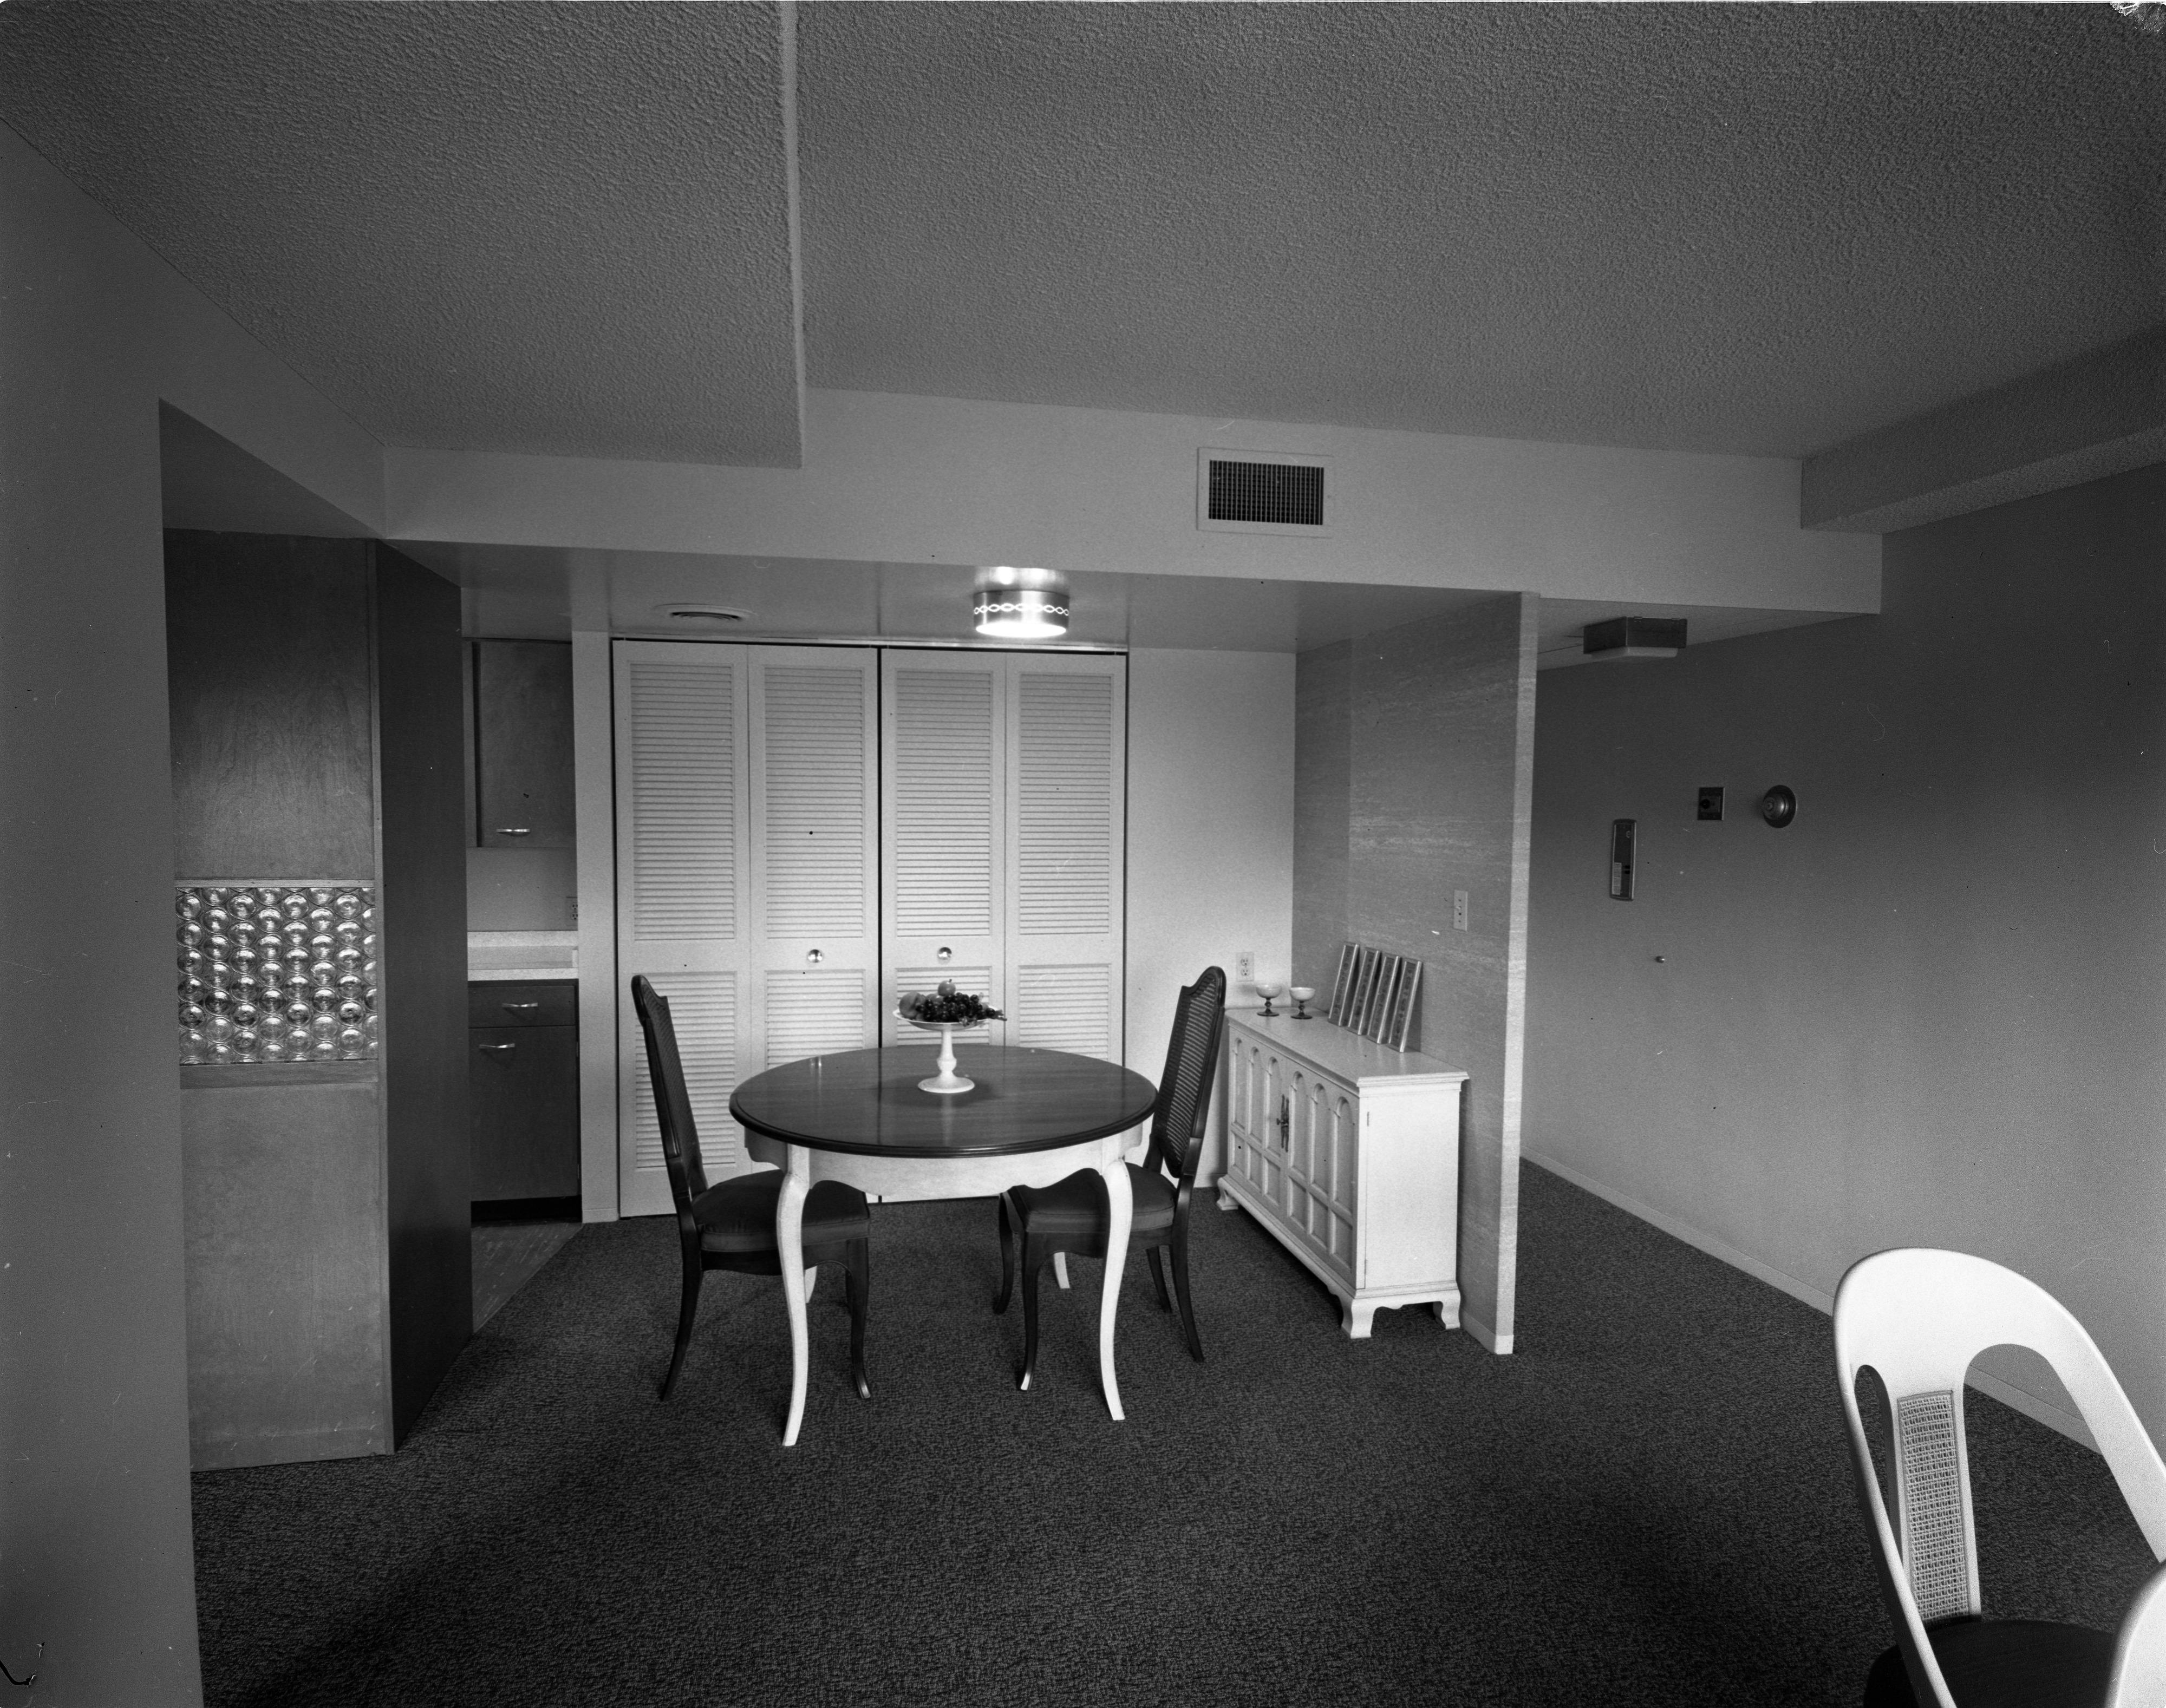 Maynard House Apartment Dining Room May 25 1962 Old News